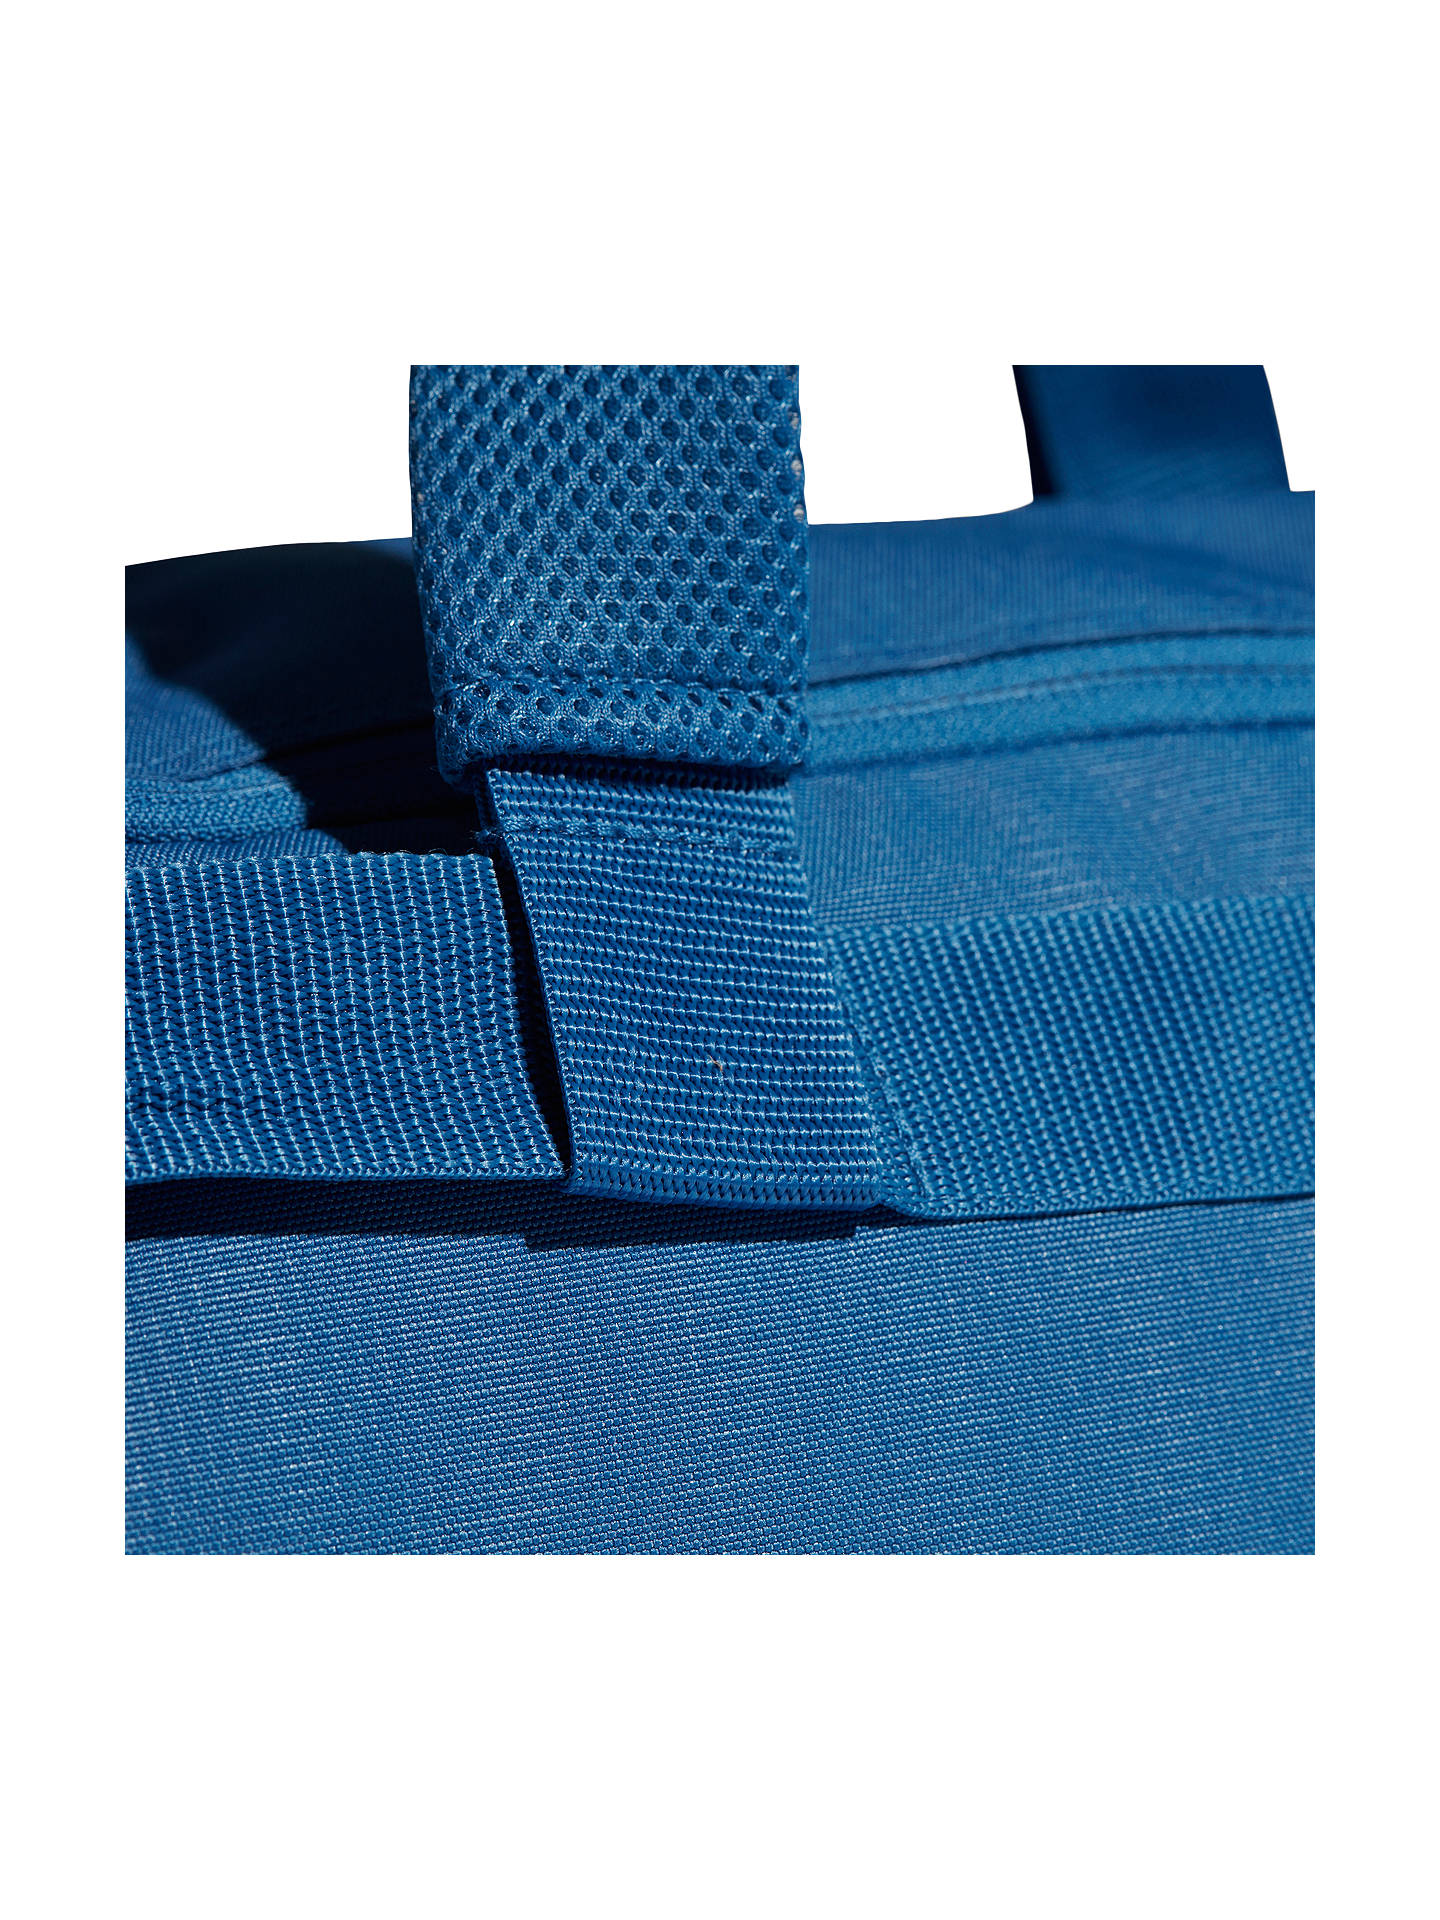 06f2c1f6b2c ... Buy adidas Convertible 3-Stripes Duffle Bag